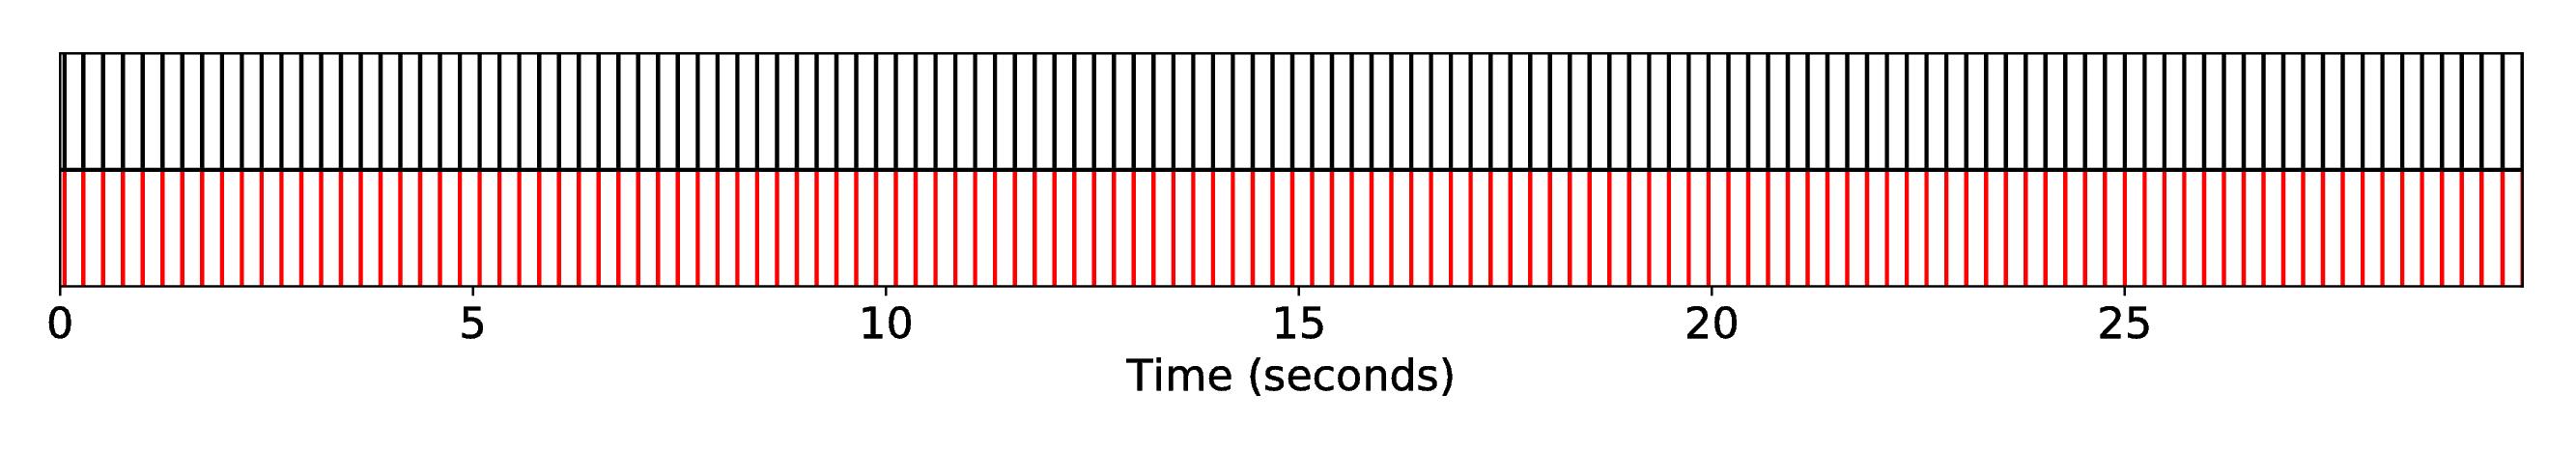 DP1_INT1_R-MRI-12__S-Fandango__SequenceAlignment